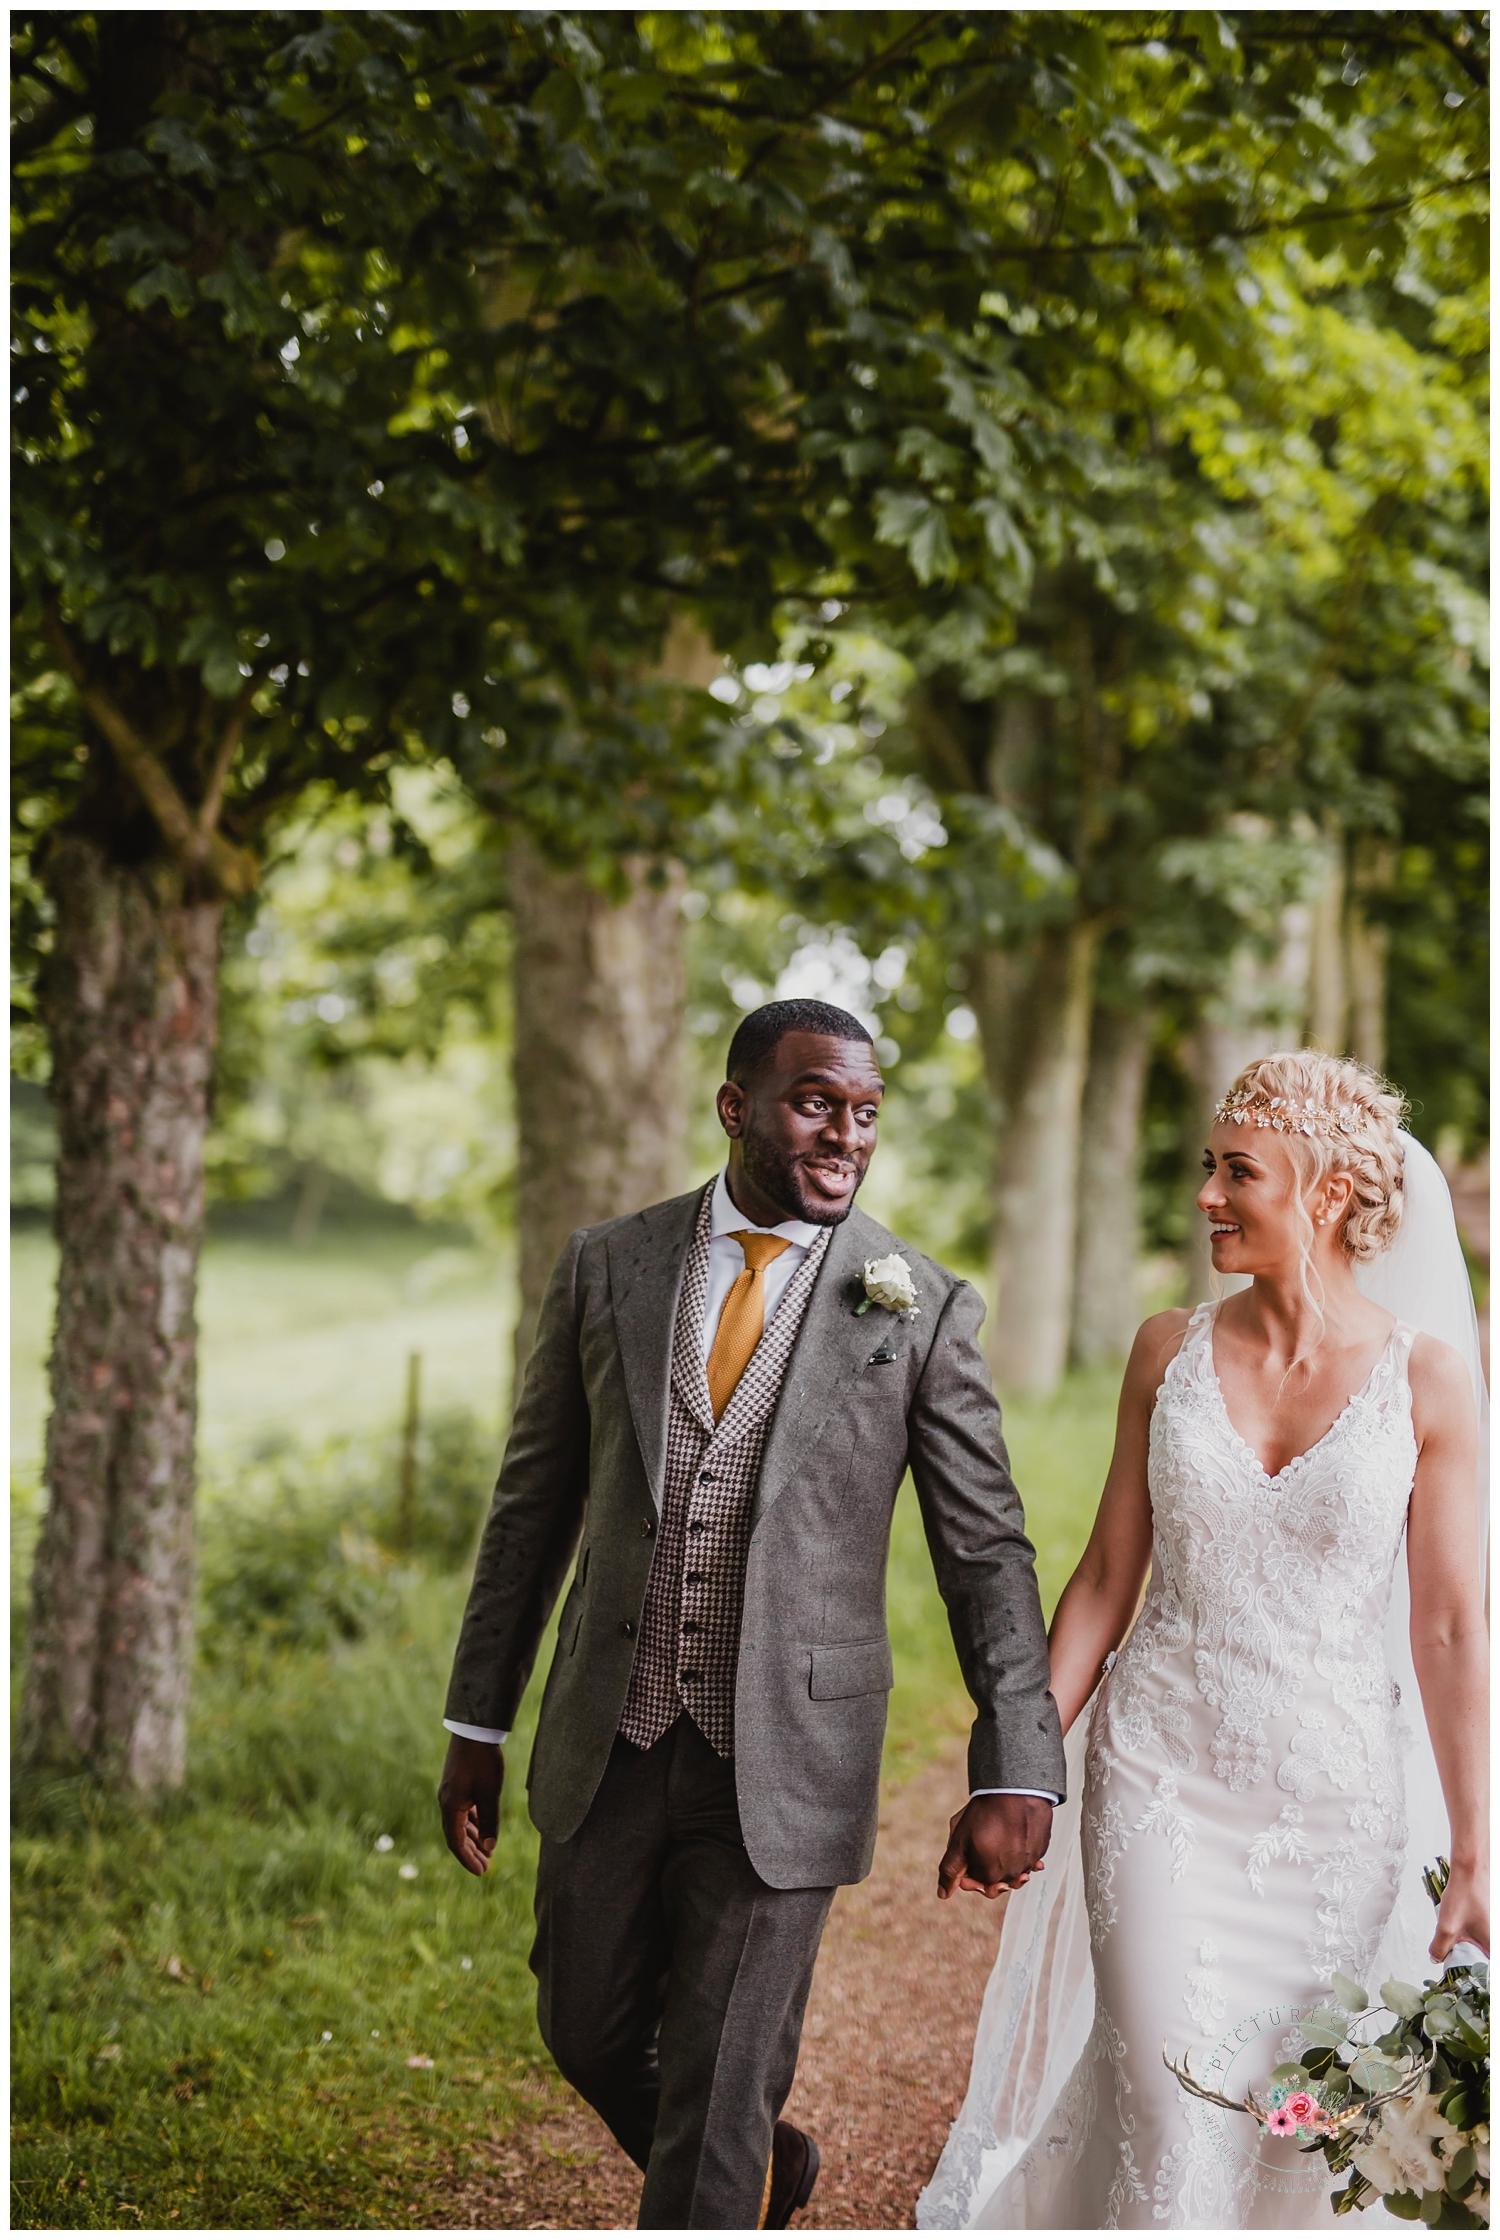 Kinkell Byre, Scottish wedding, Picturesque, WeddingPhotography, Scotland_0062.jpg